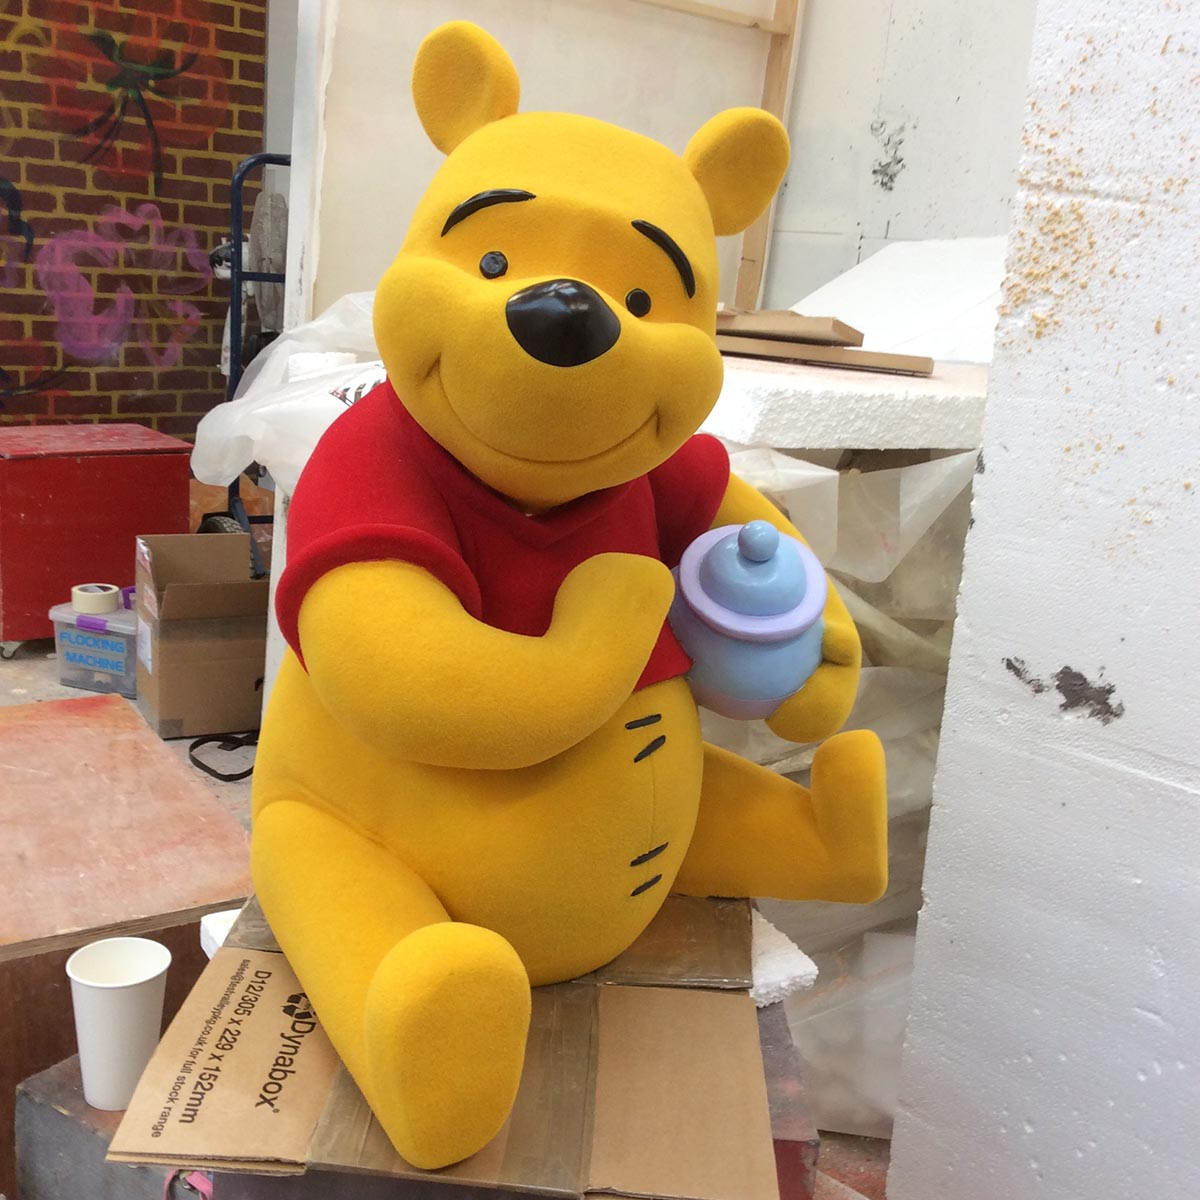 Winnie the Pooh flocked sculpture